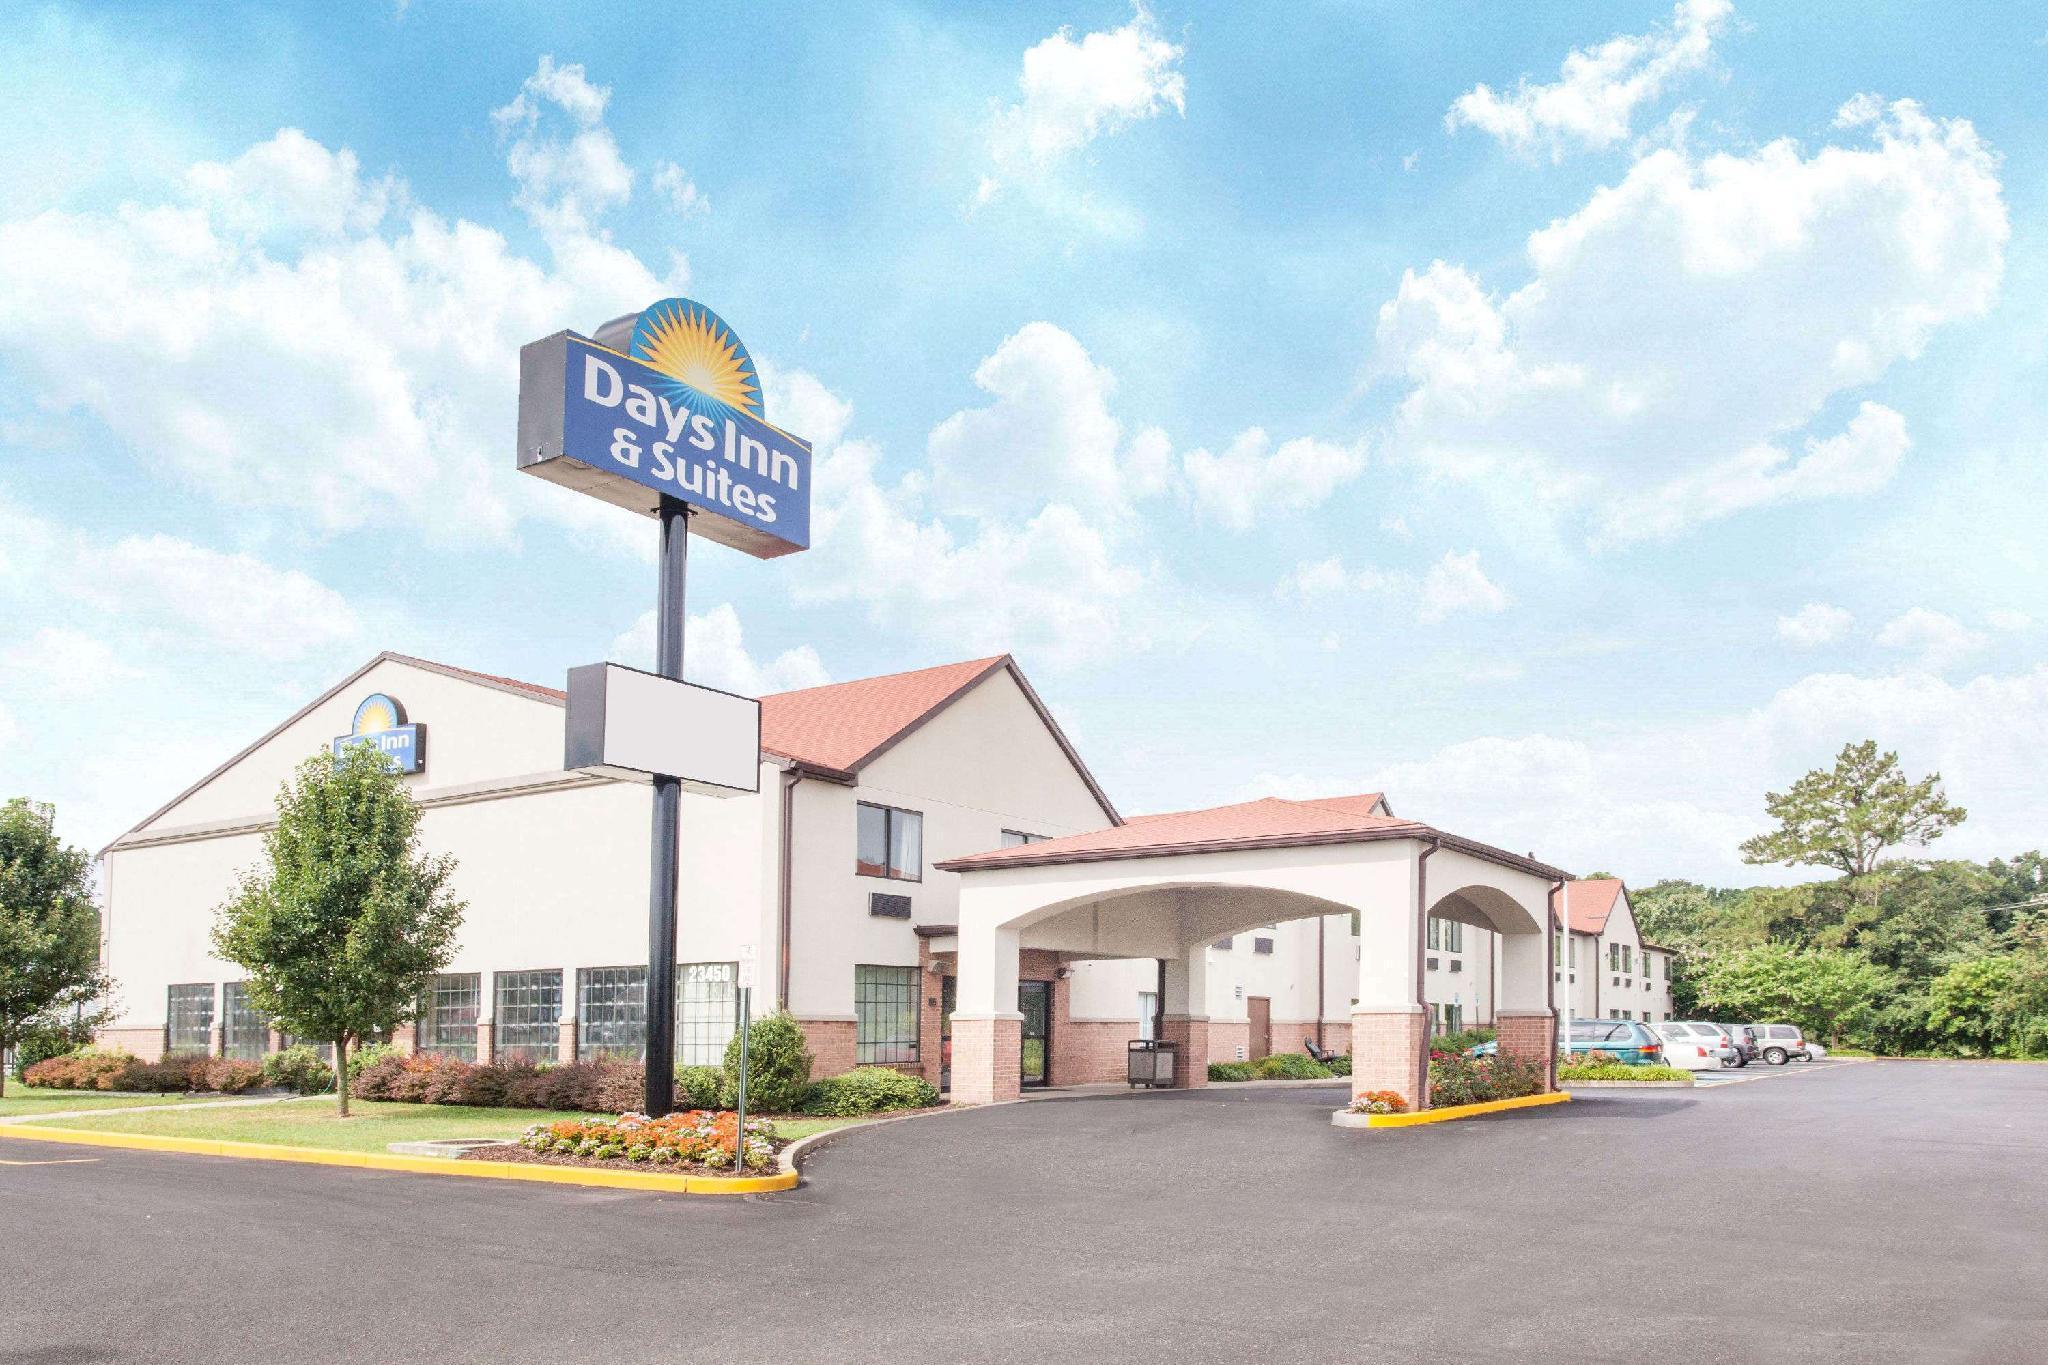 Days Inn And Suites By Wyndham Seaford